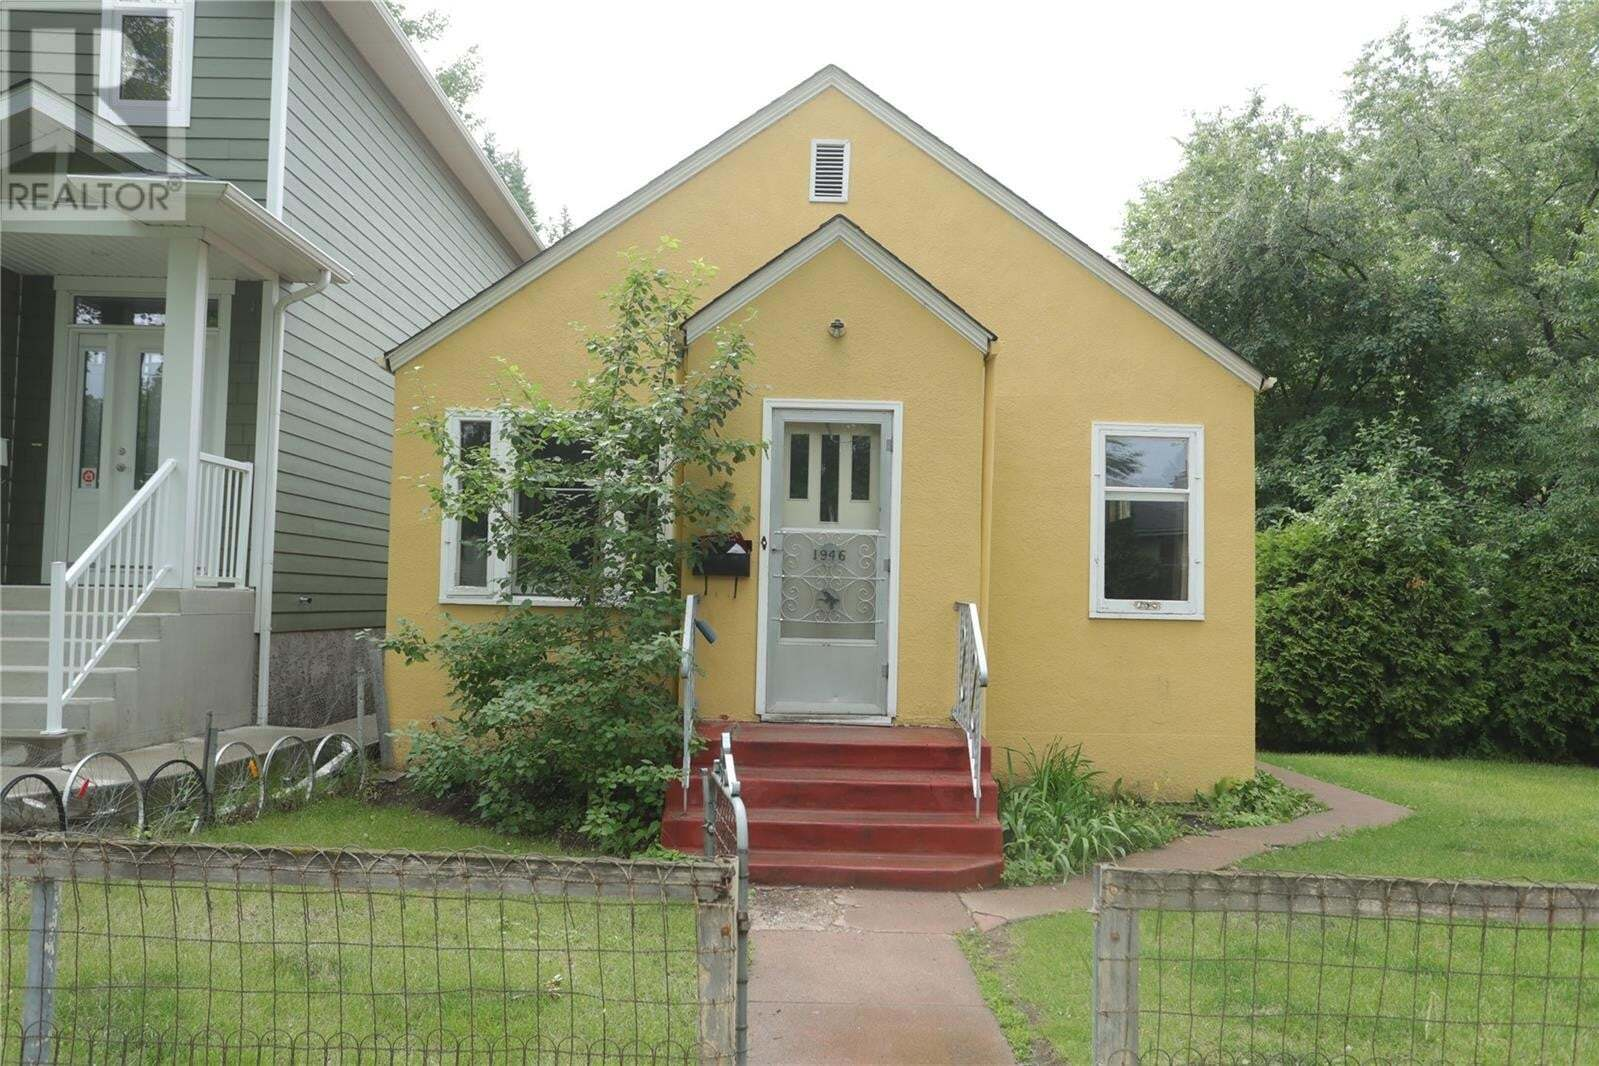 House for sale at 1946 Lorne Ave Saskatoon Saskatchewan - MLS: SK817138